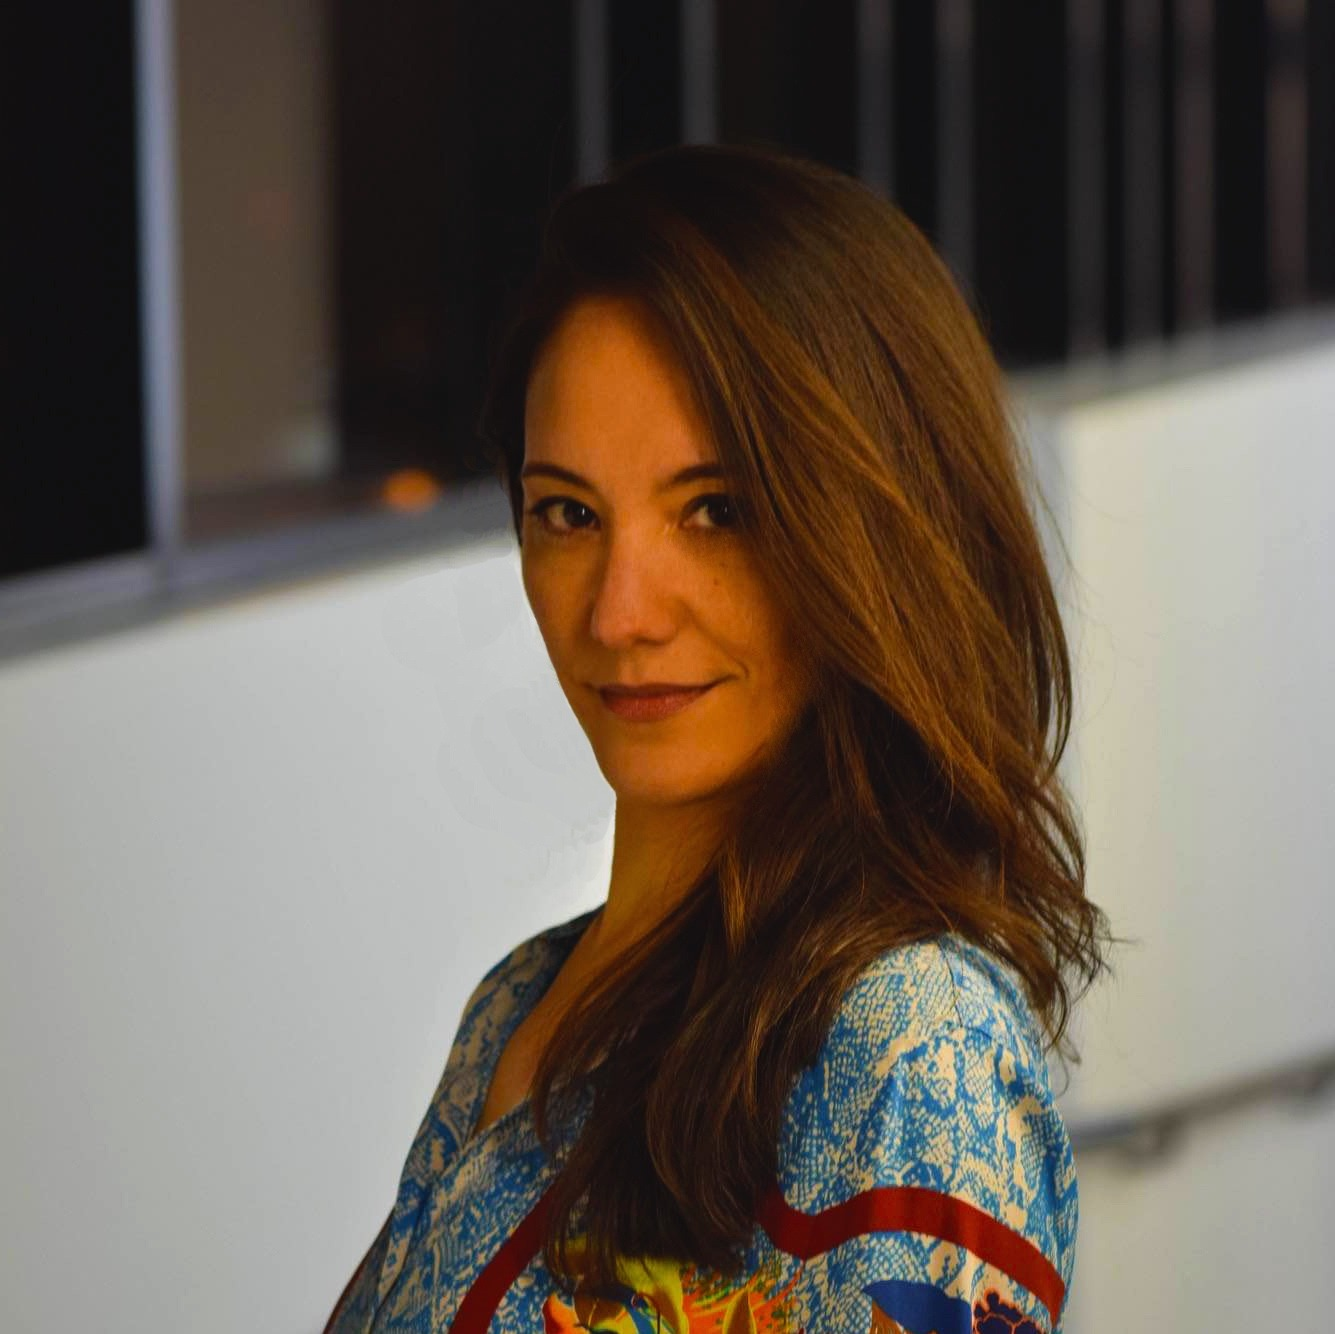 Sarah Macaraeg